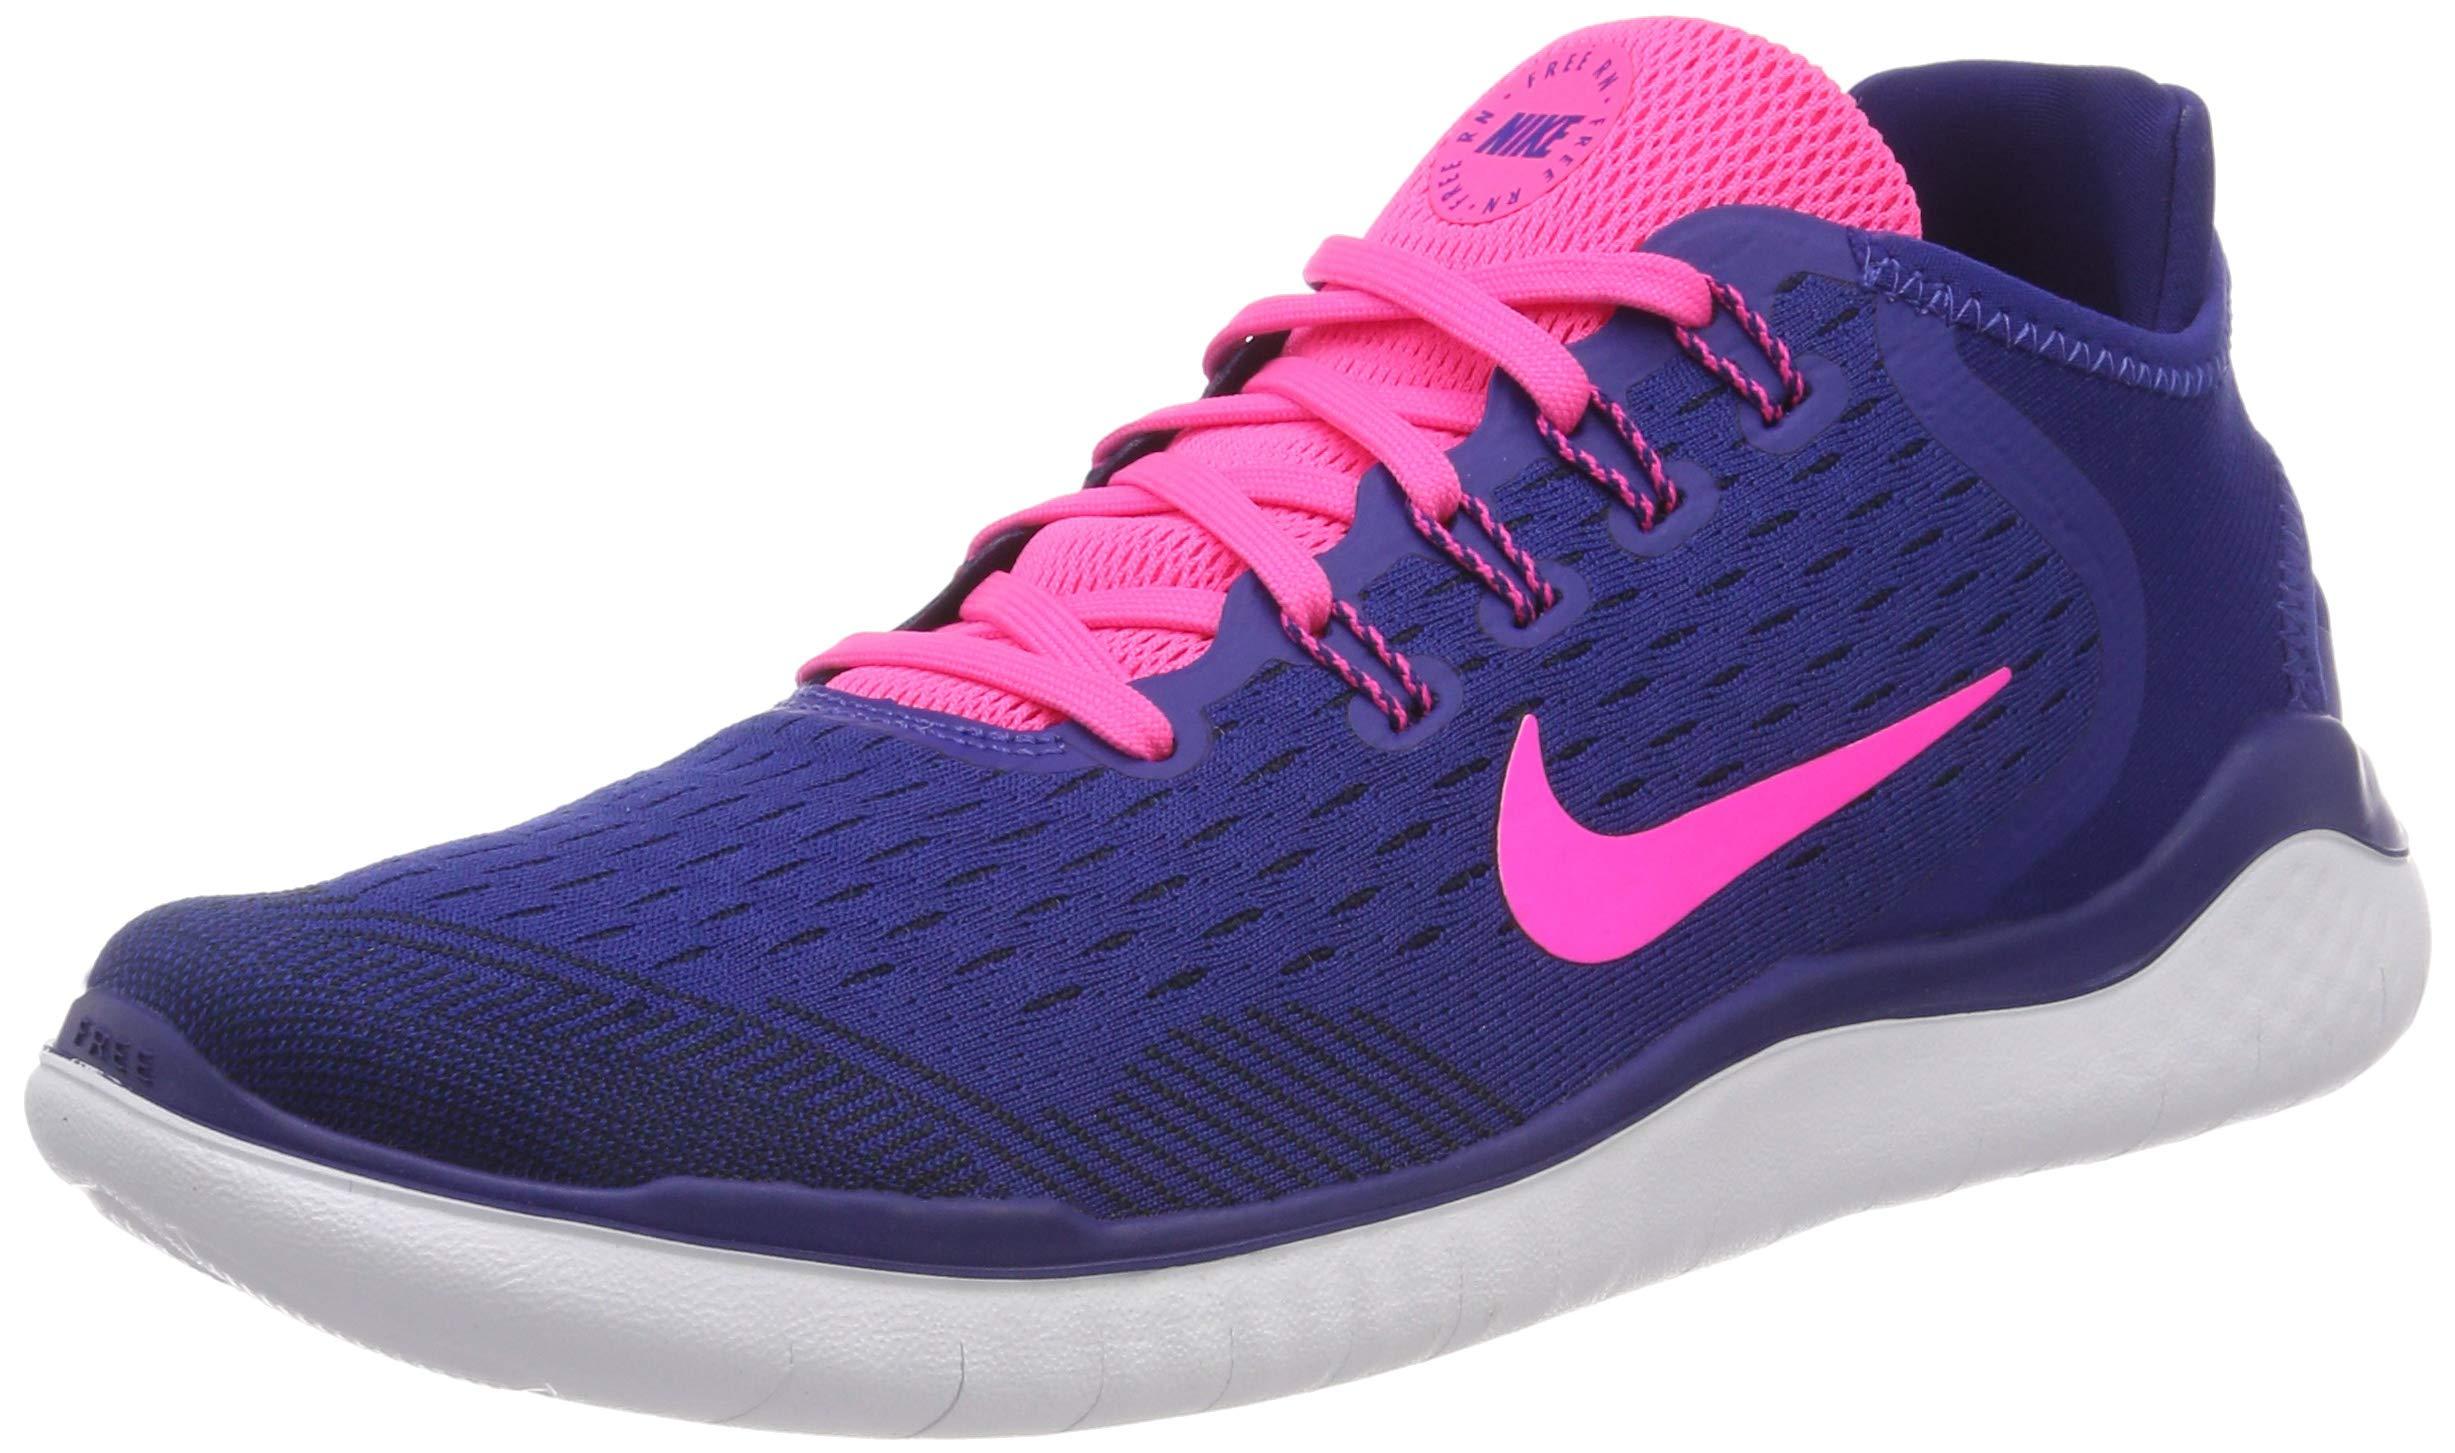 e9ee6cd50a35d Nike Women's Free RN 2018 Running Shoe Deep Royal Blue/Pink 5.5 M US